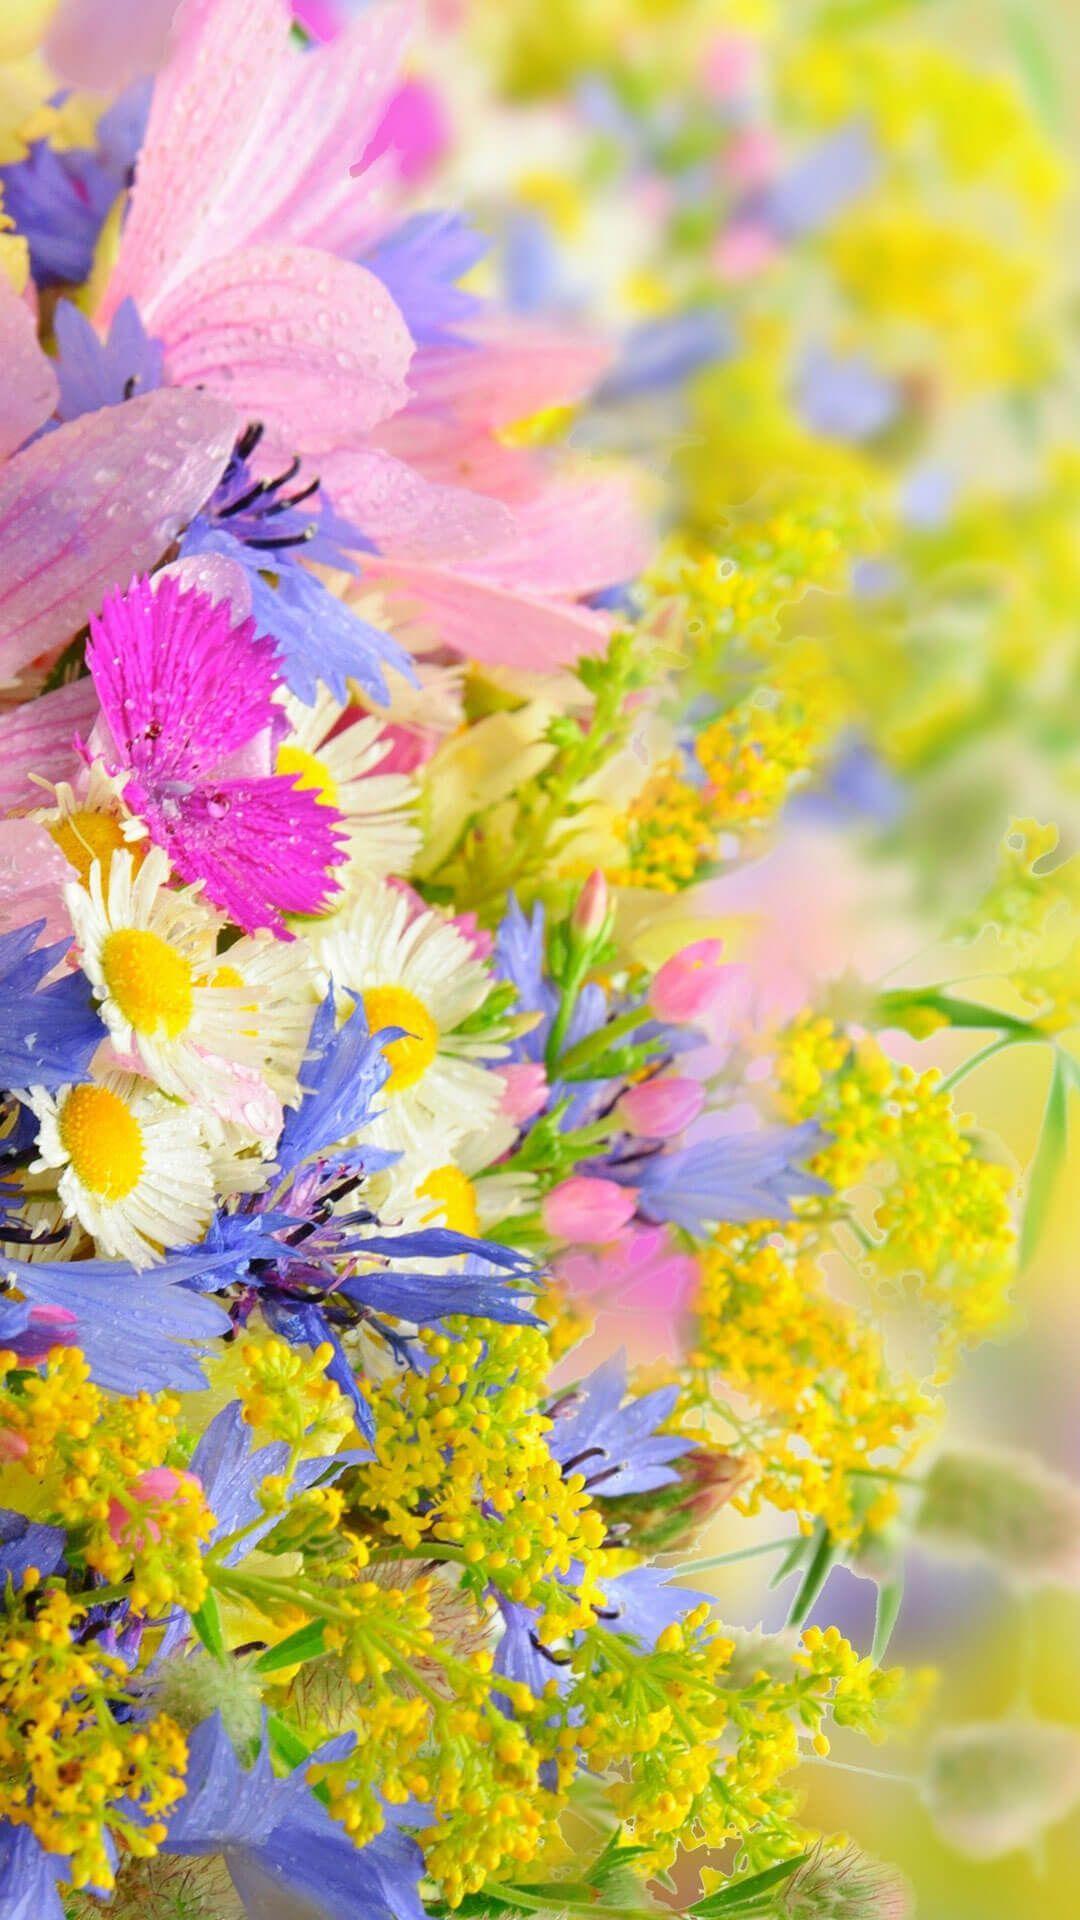 Spring Flower Garden Flower iphone wallpaper, Yellow